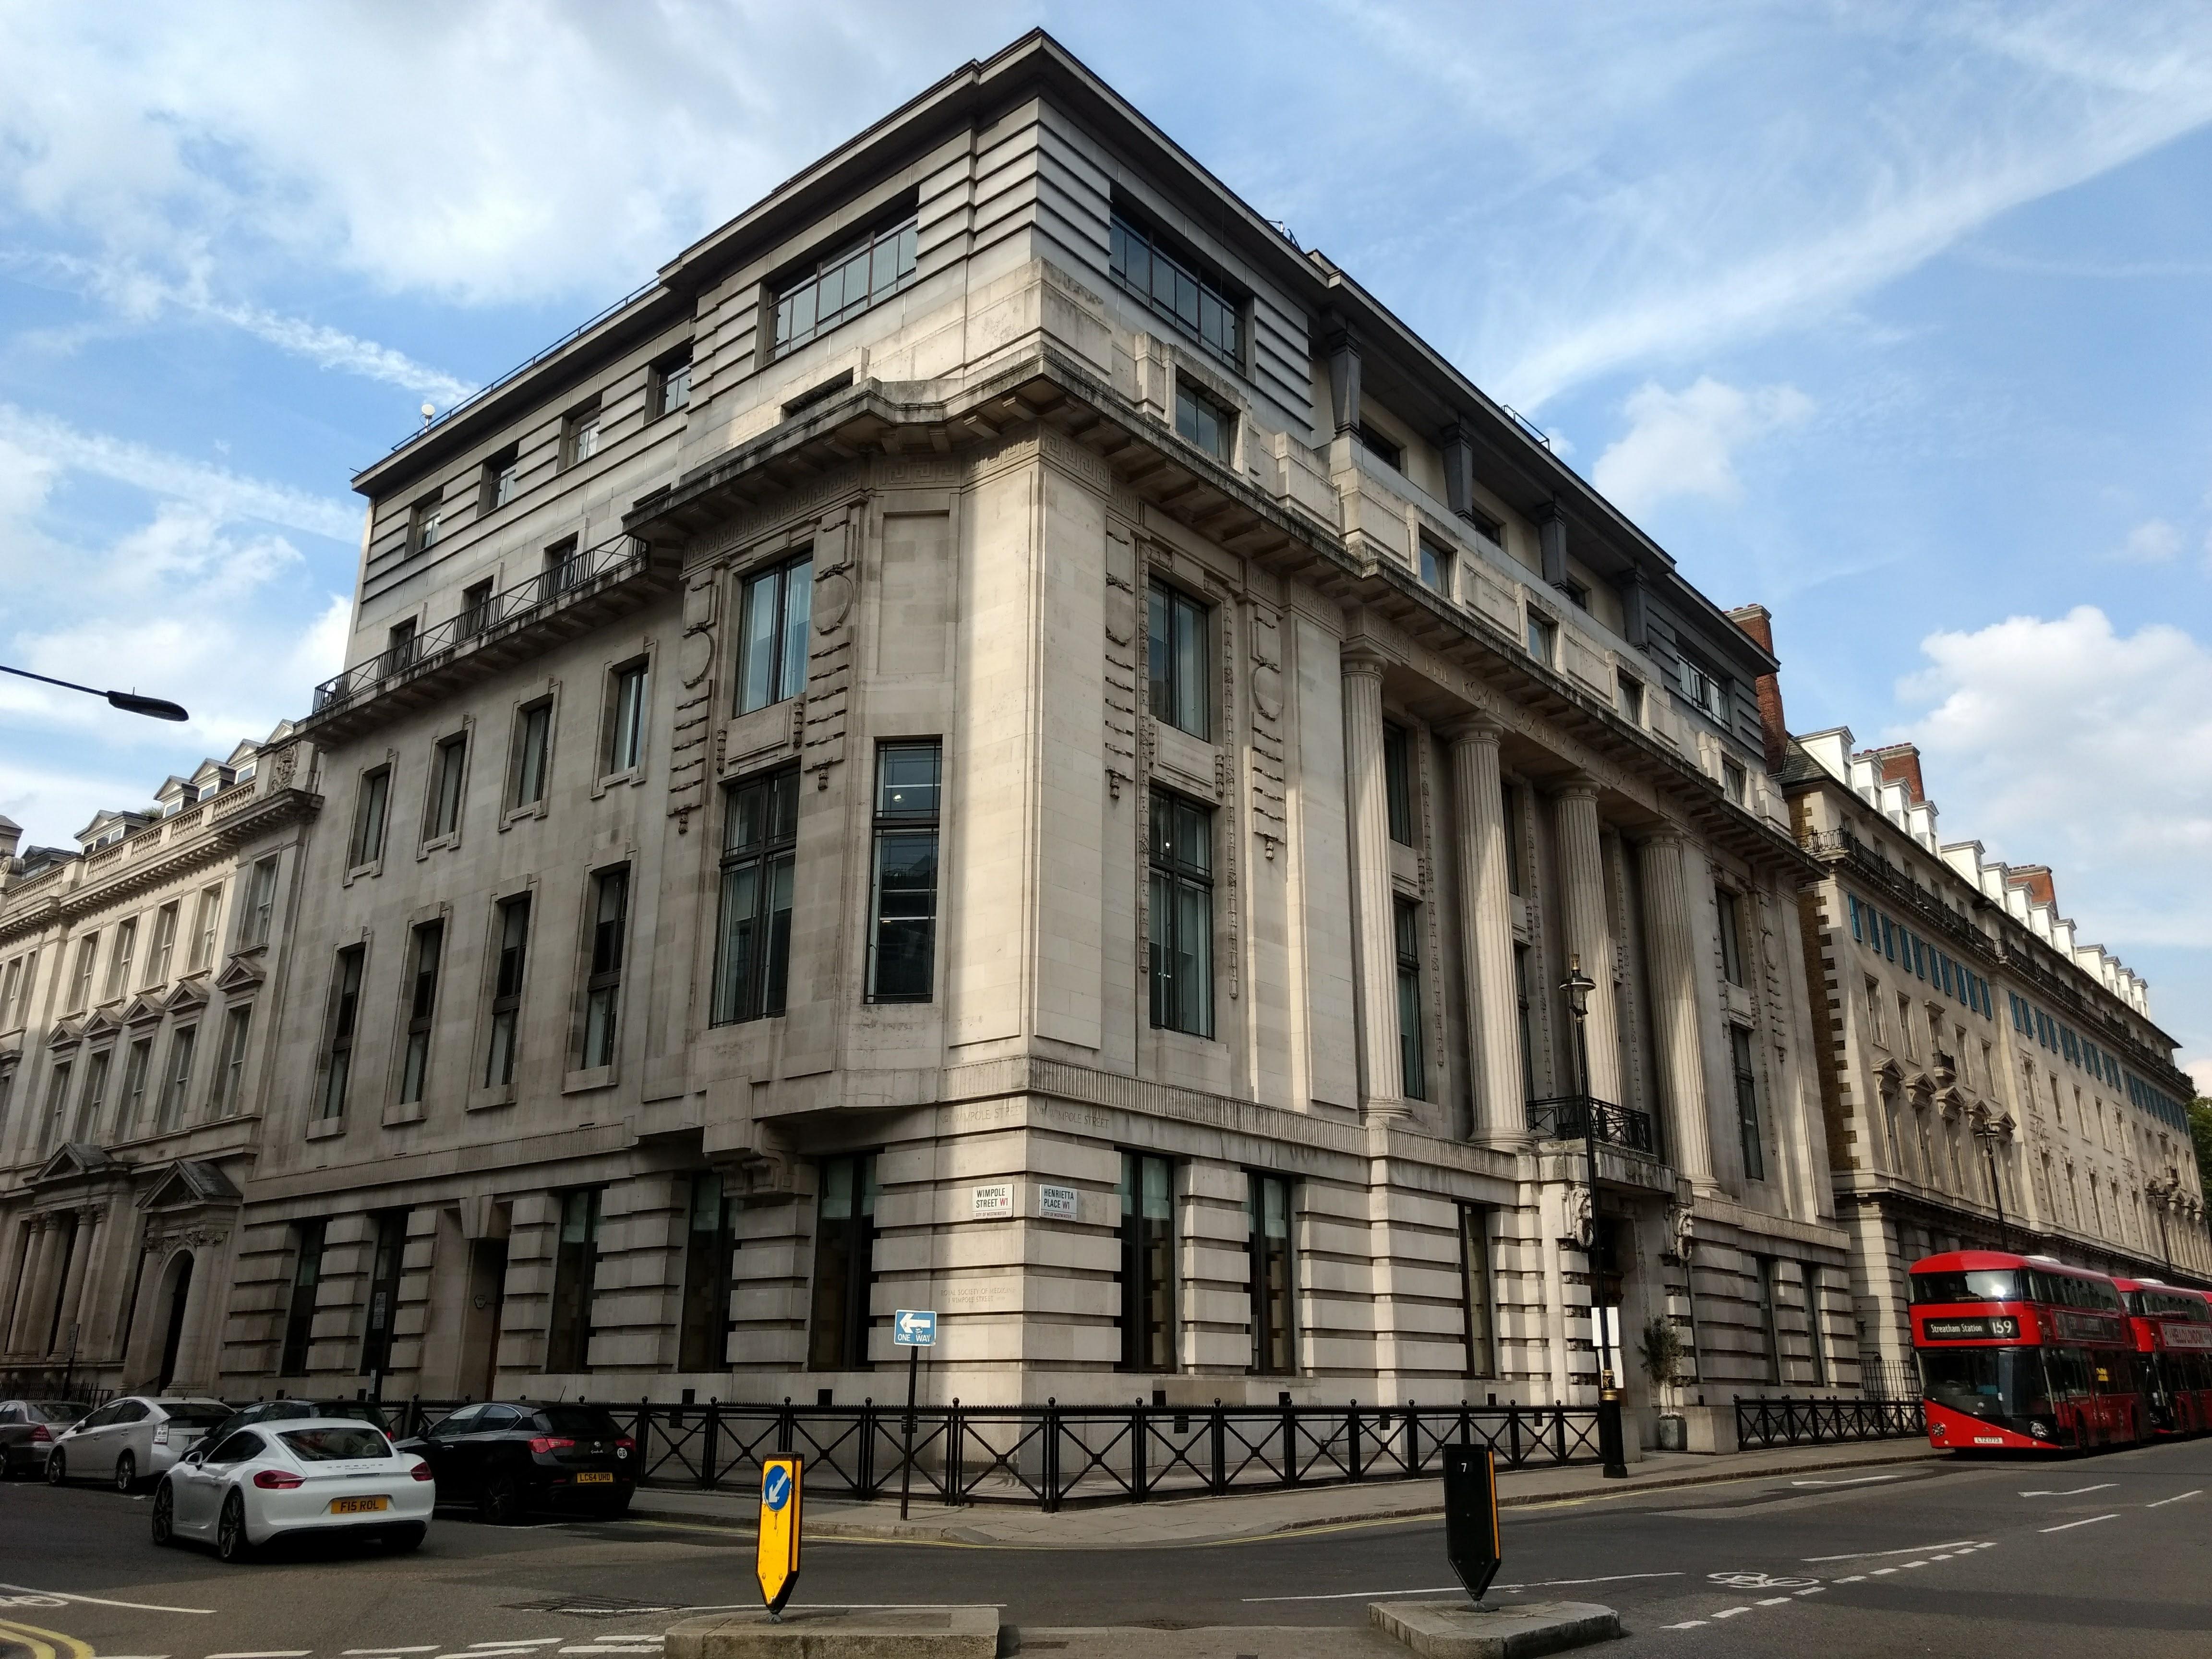 Royal Society of Medicine - Wikipedia